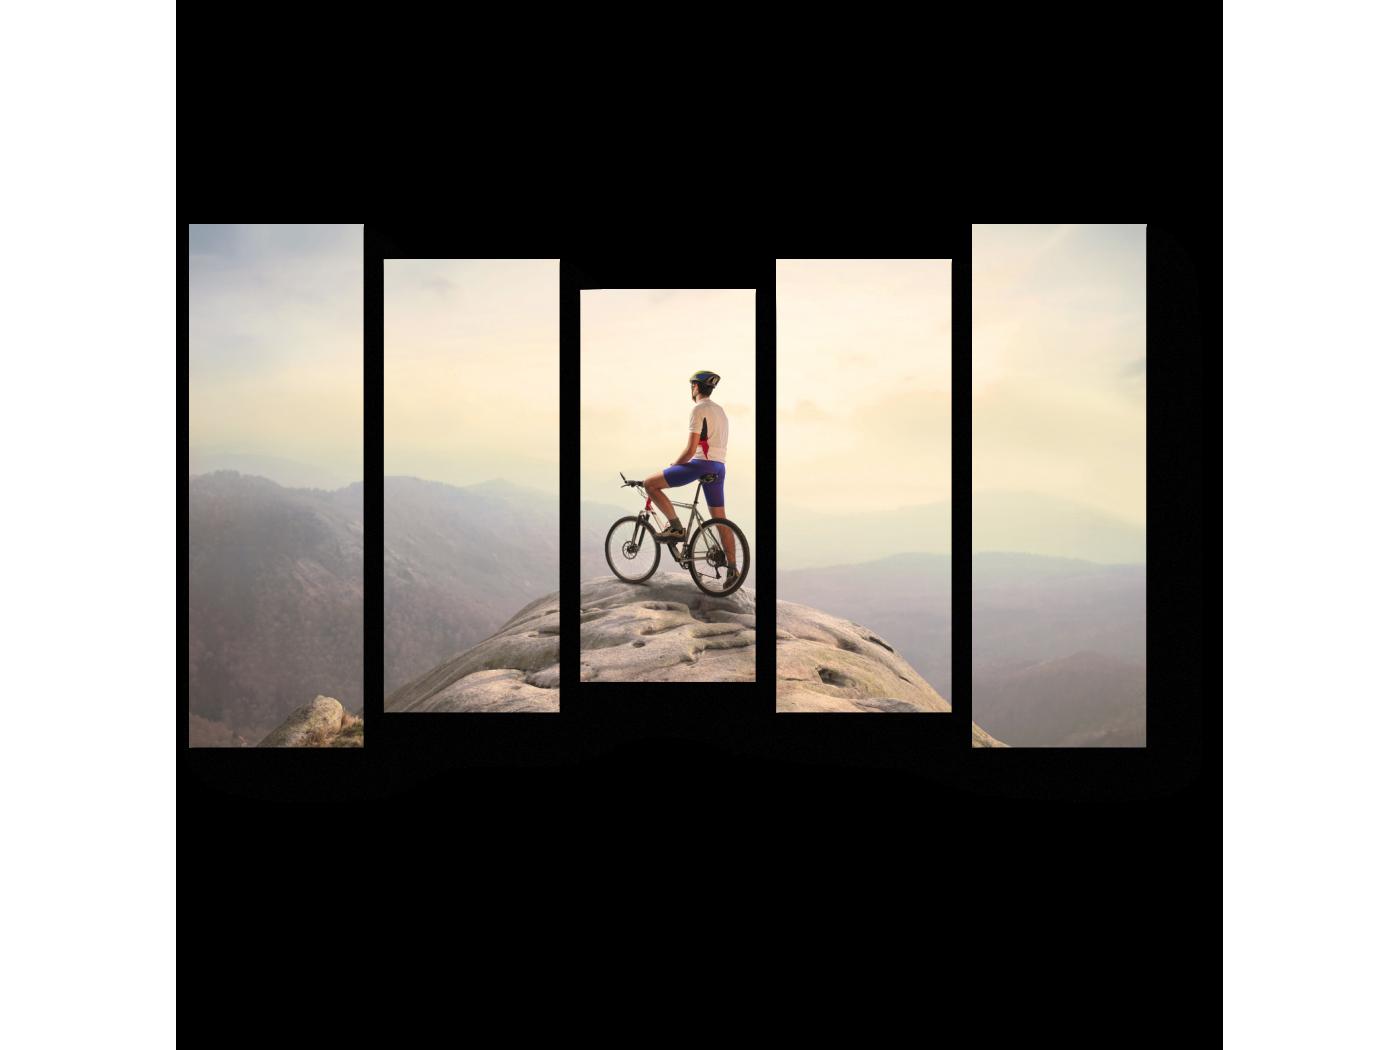 Модульная картина На вершине холма (90x54) фото